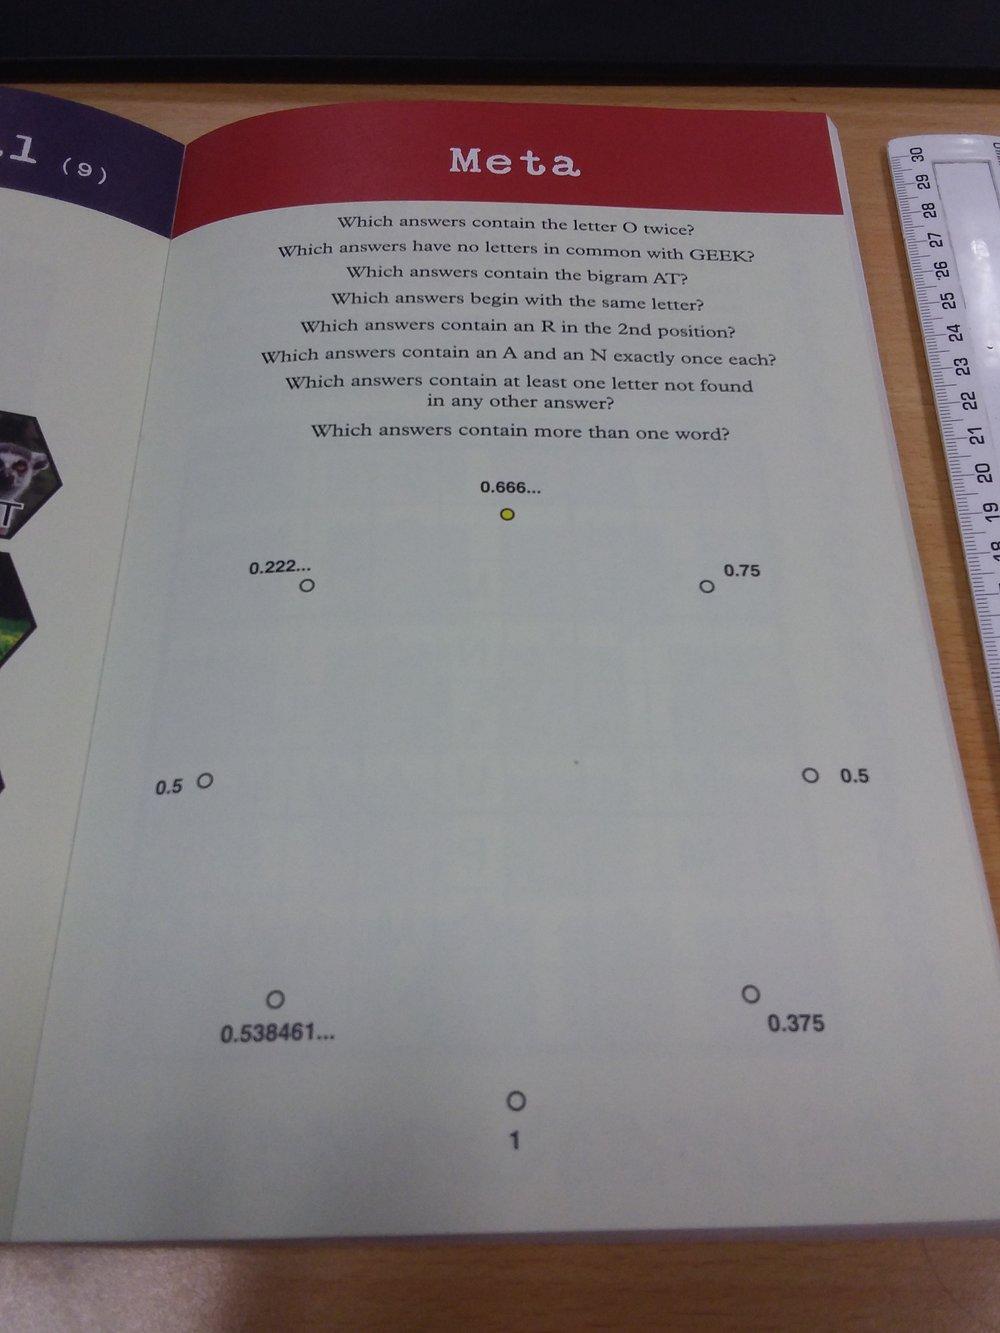 Gchq Christmas Puzzle Solutions Part 2 Meta Puzzle Alaricstephen